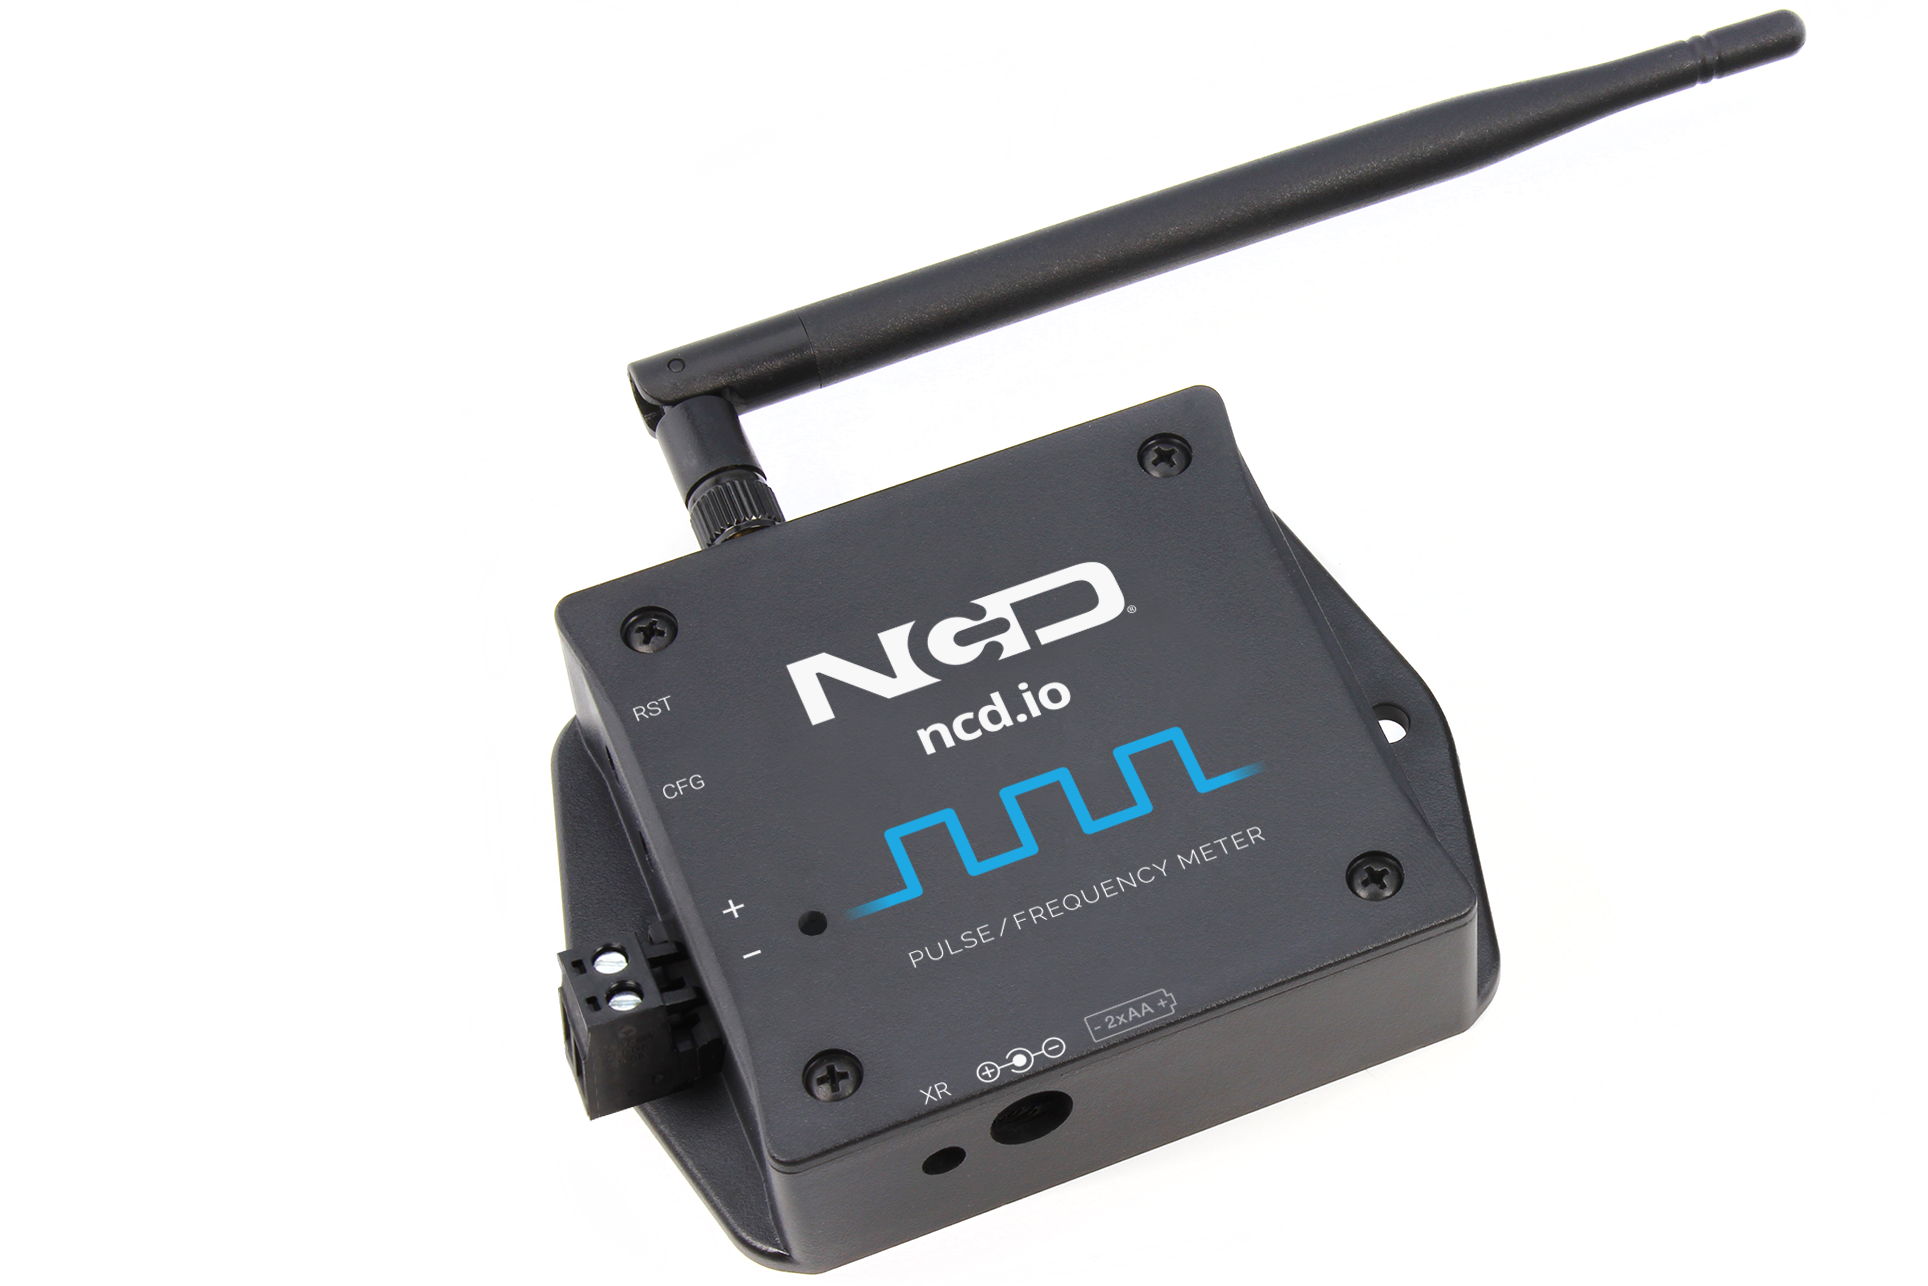 Iot Long Range Wireless Pulse Frequency Meter Counter Tachometer Schematic Monitor Sensor